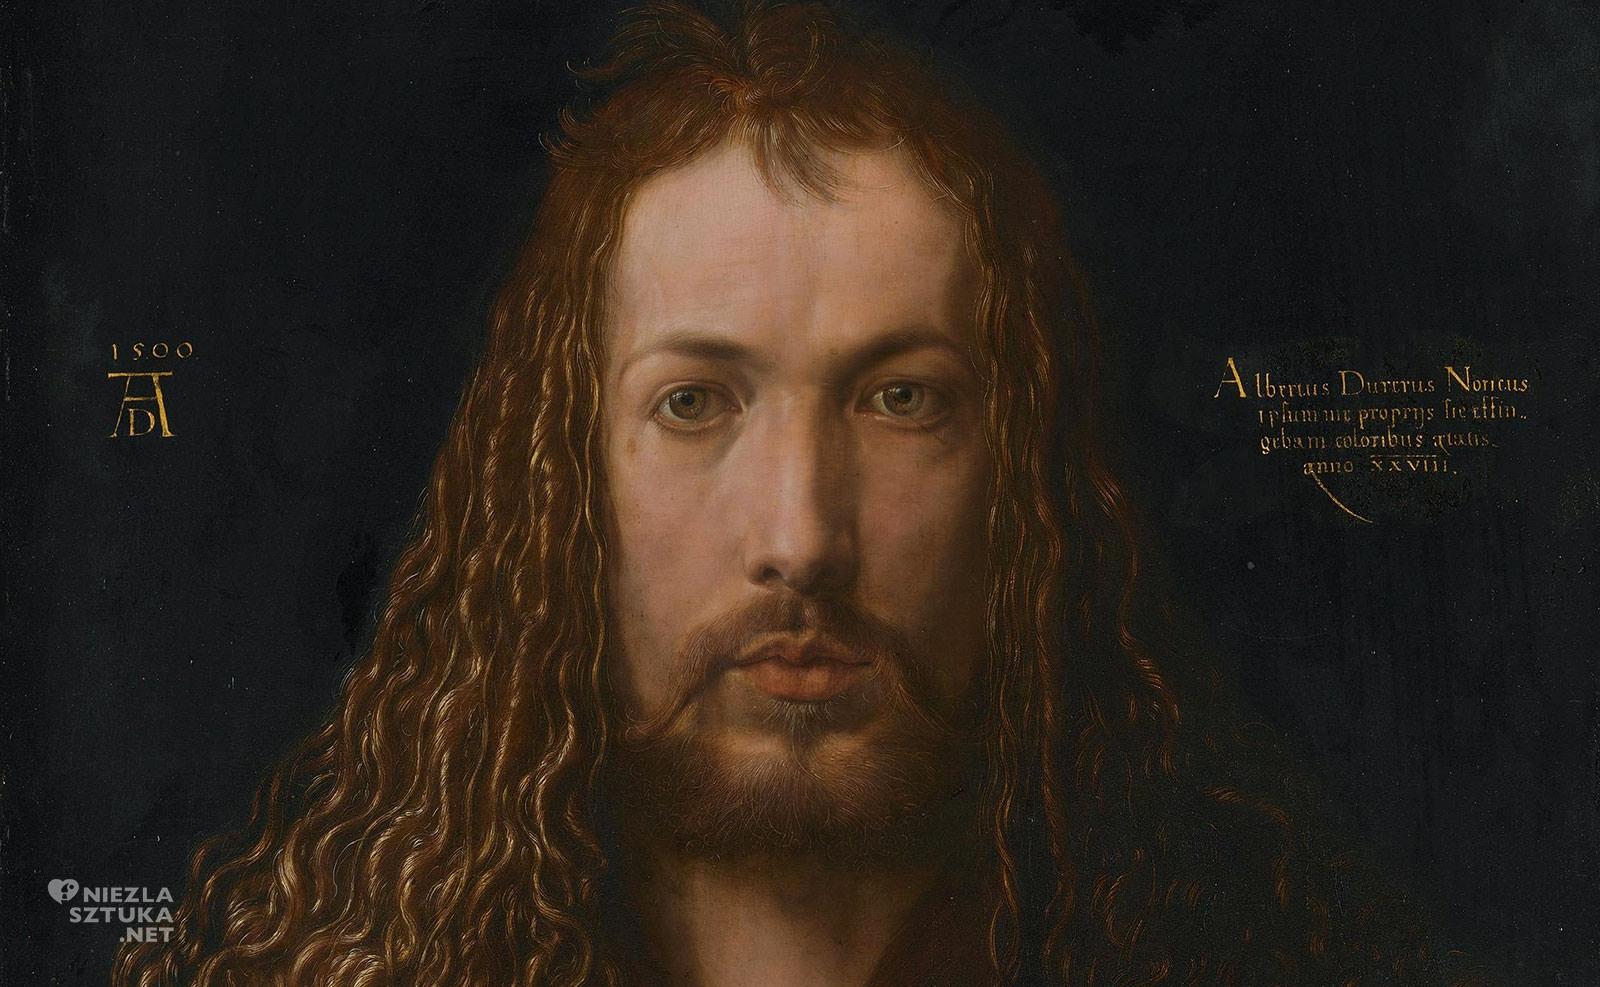 Albrecht Dürer, Autoportret w futrze, Niezła Sztuka